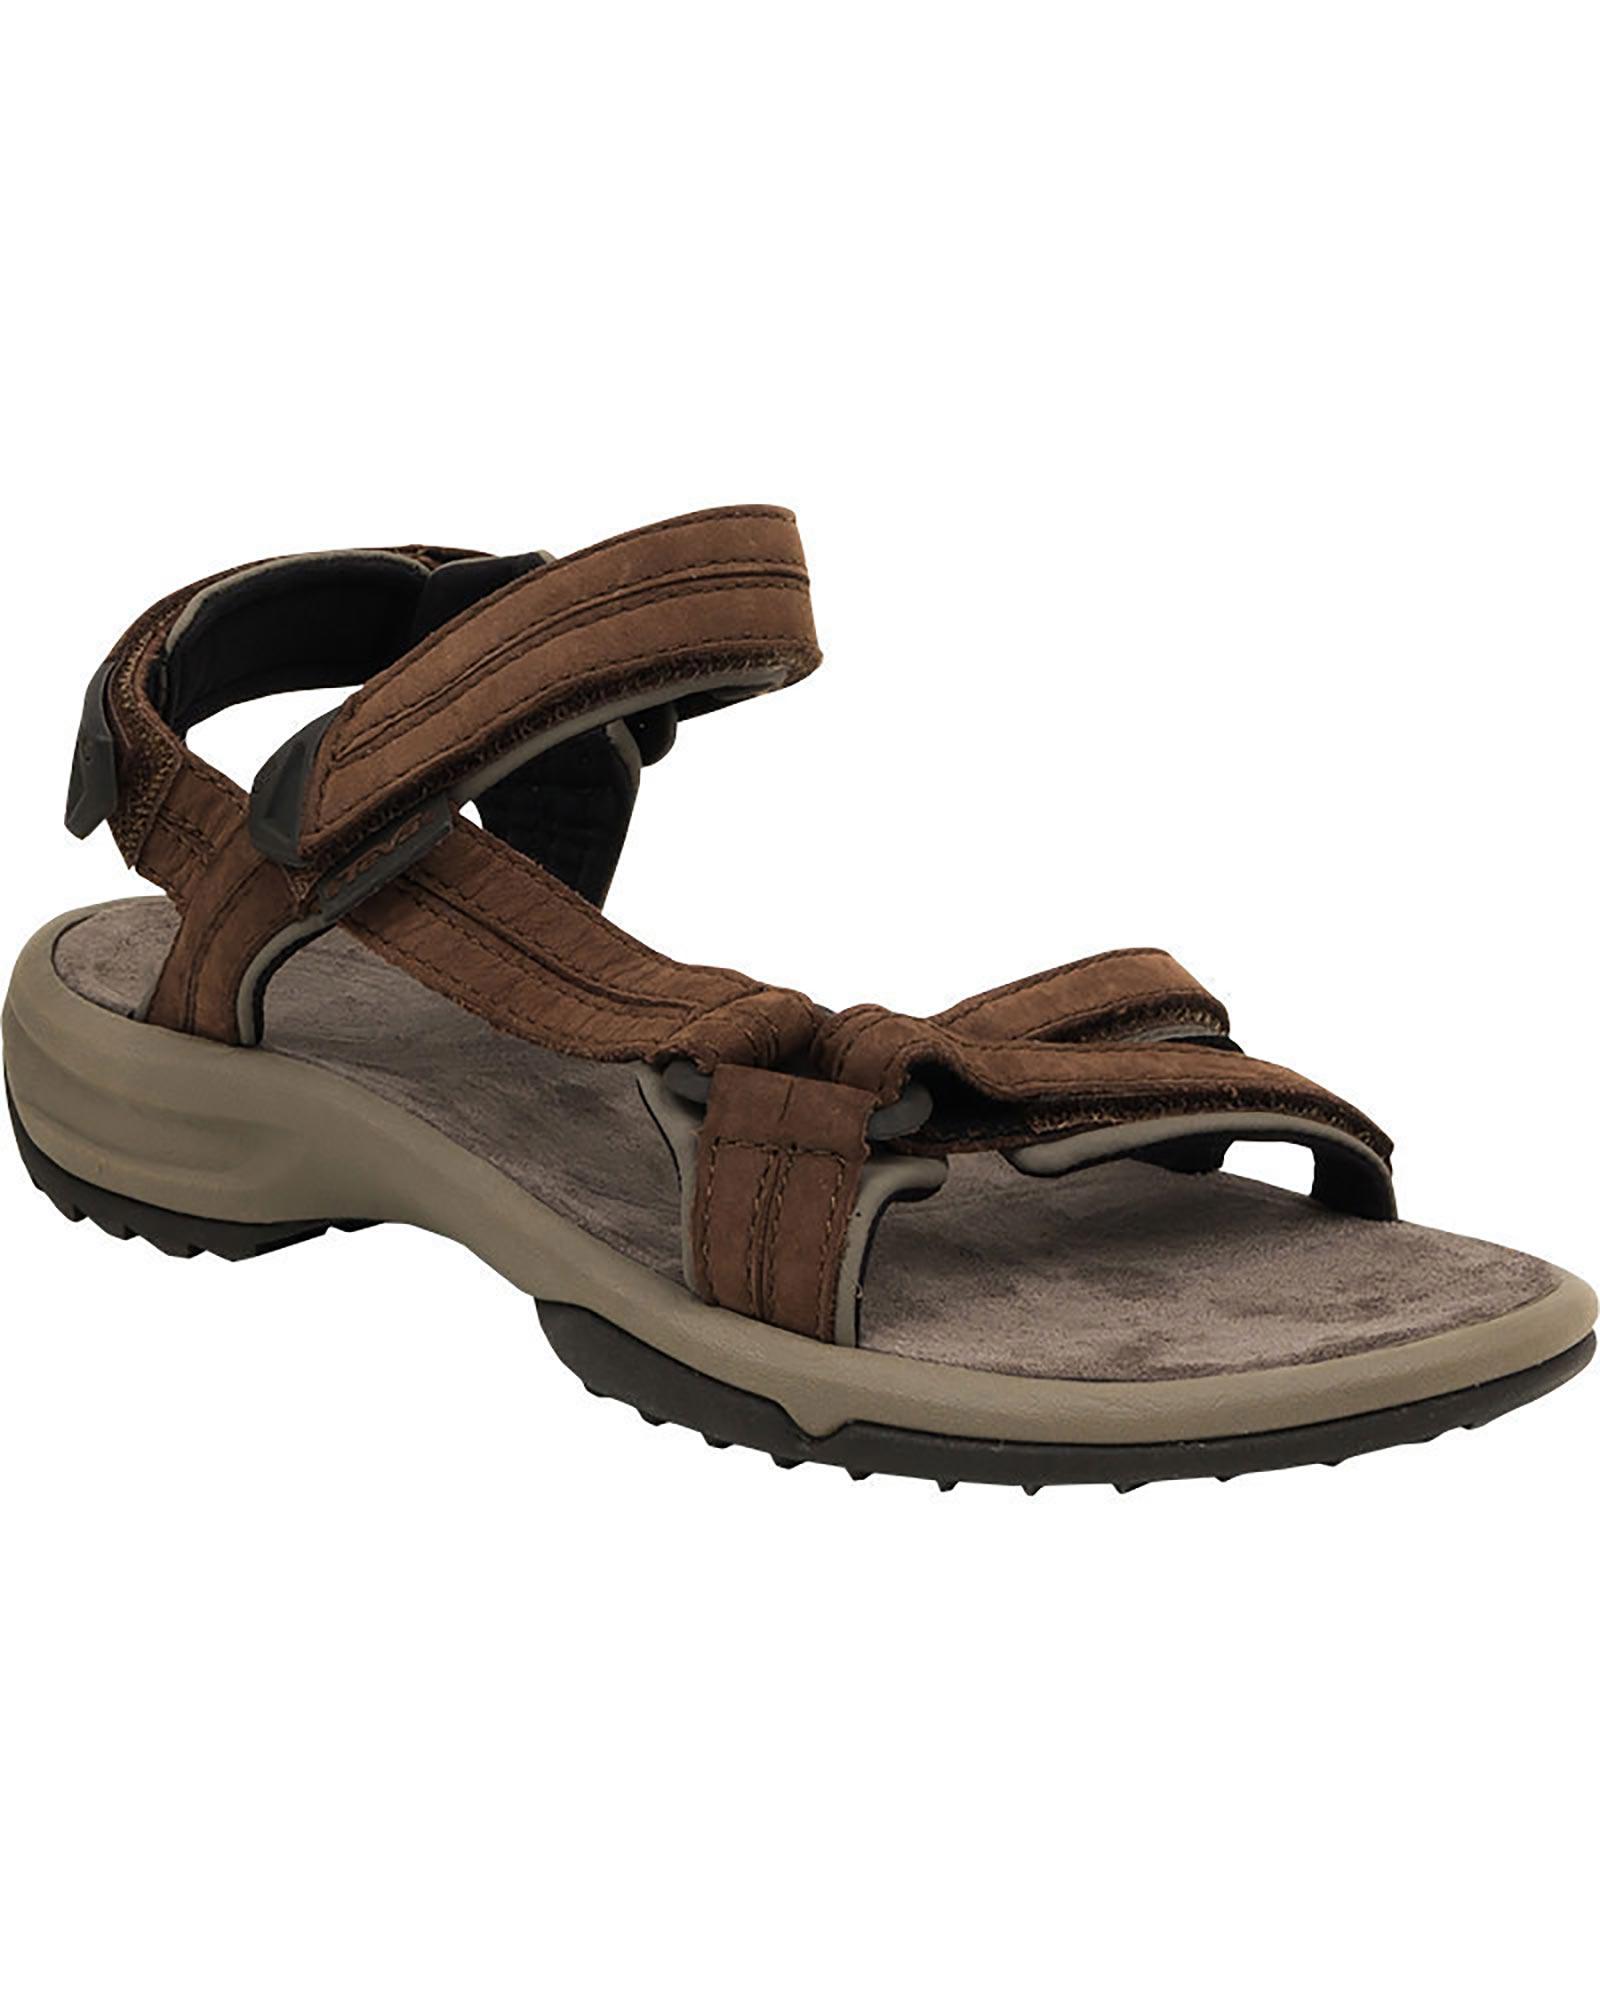 Teva Women's Terra Fi Lite Leather Sandals 0